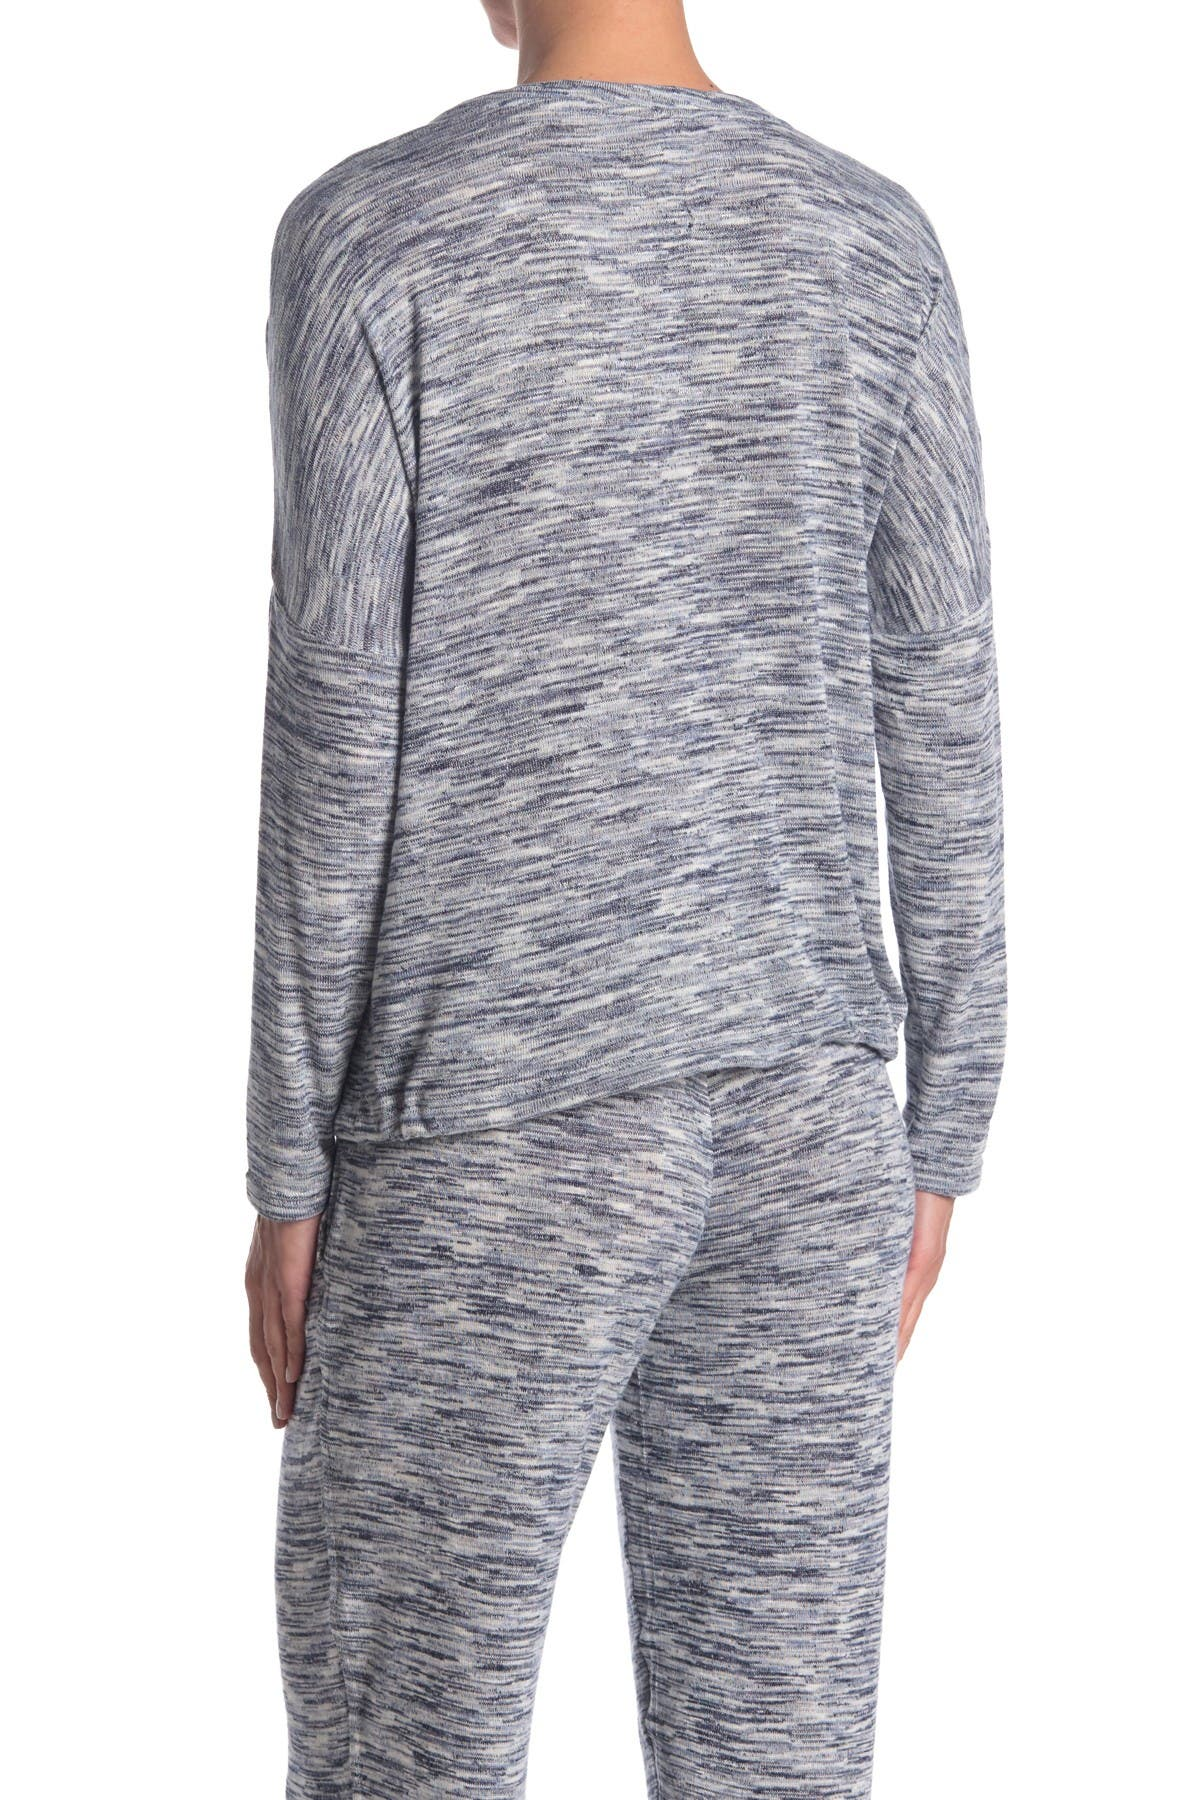 Image of HUE Space Dye Long Sleeve Pajama Shirt